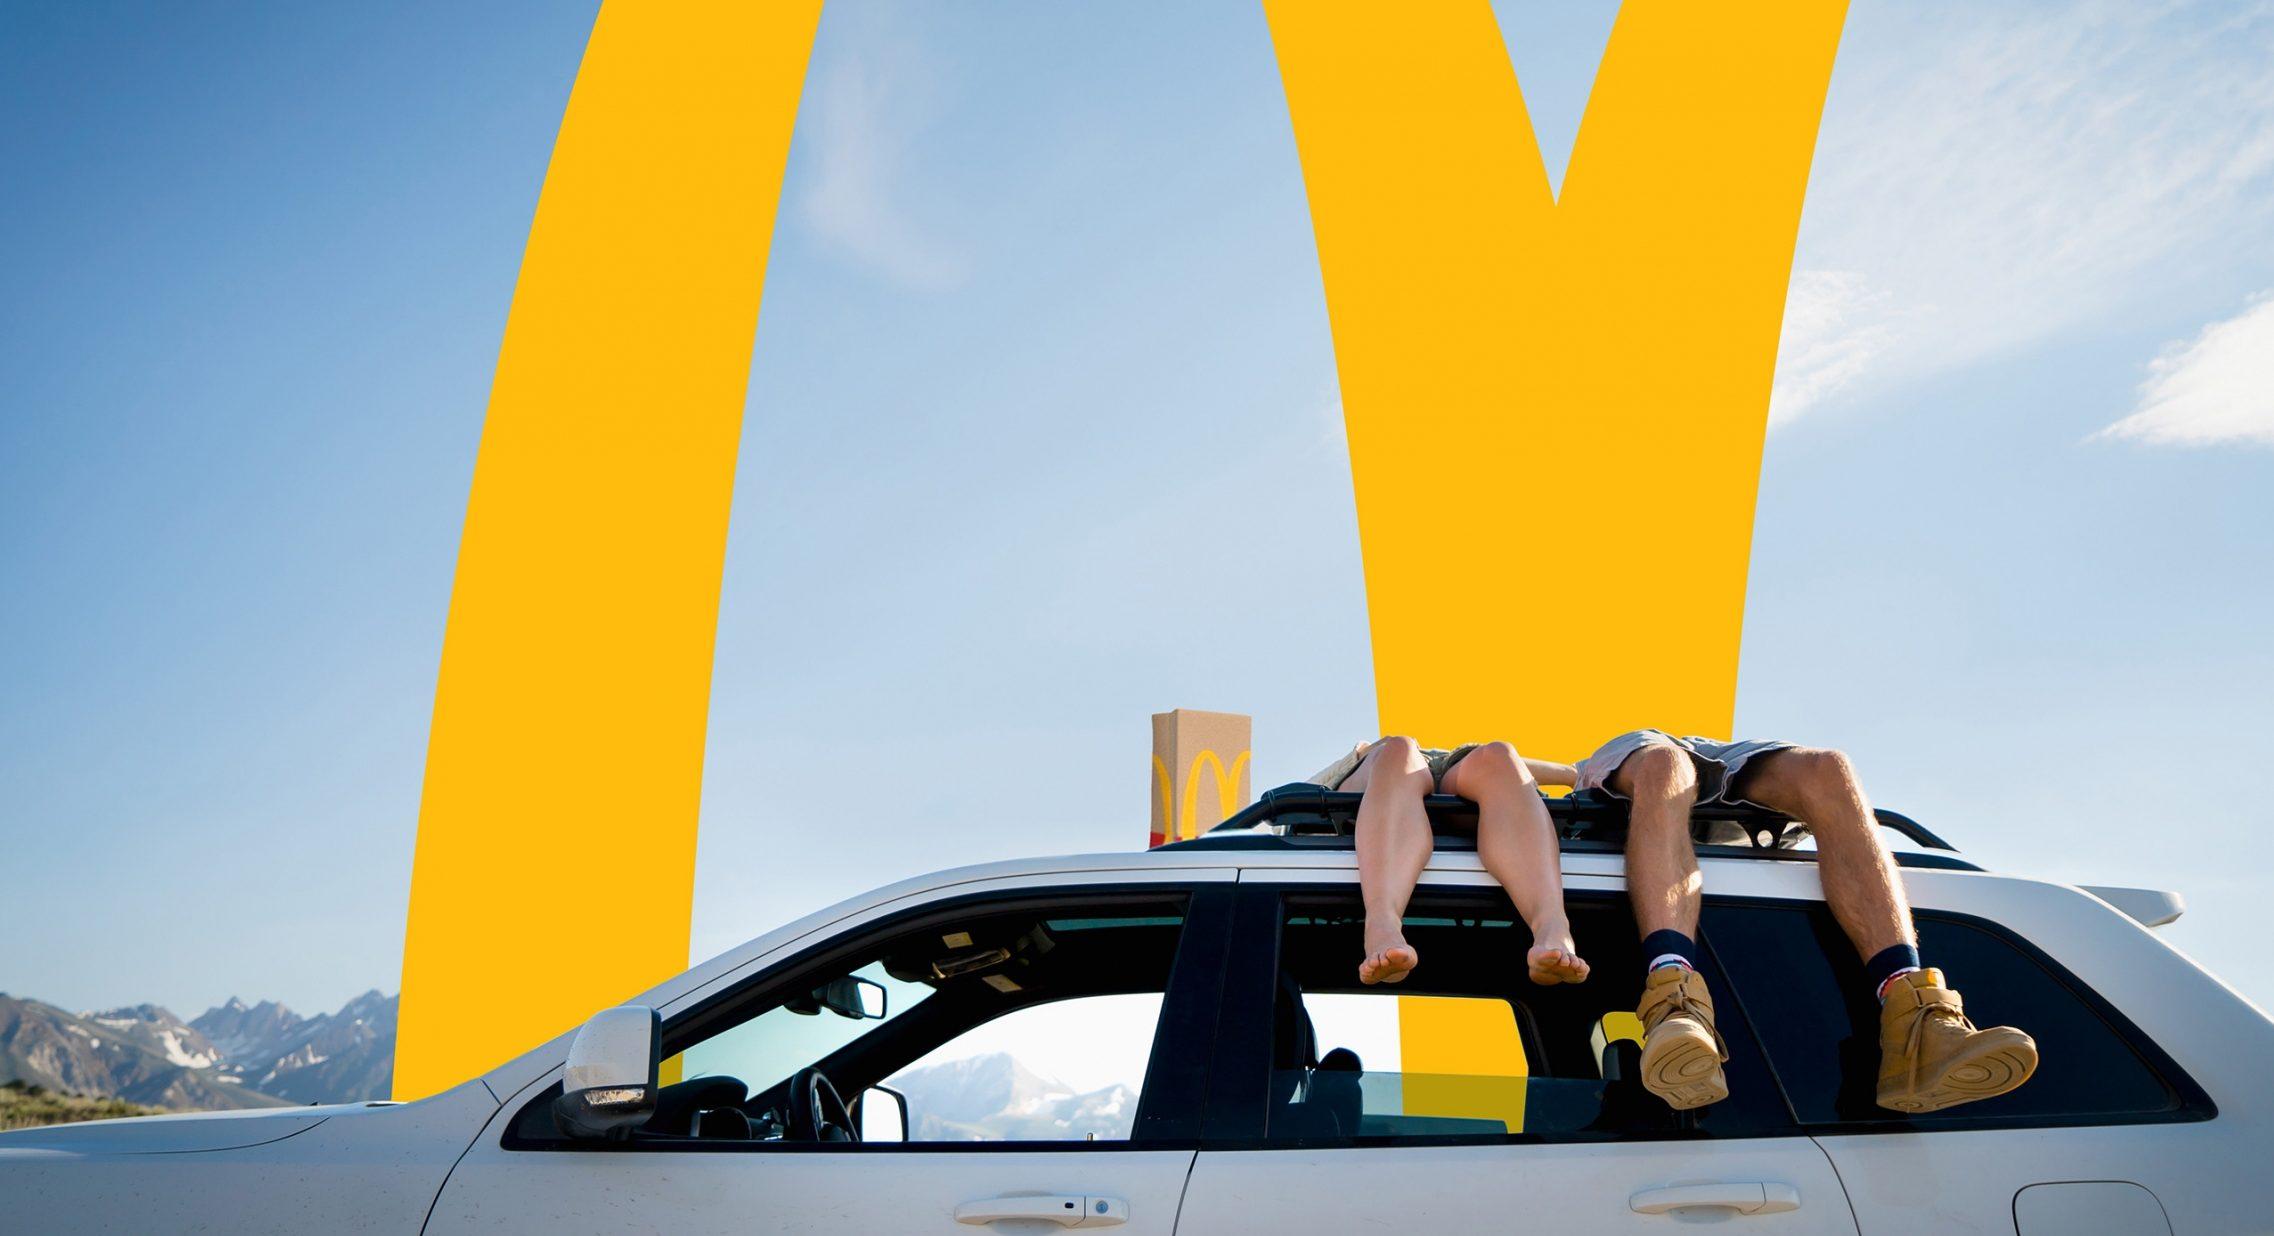 Design: After Burger King & Subway, Turner Duckworth Wows